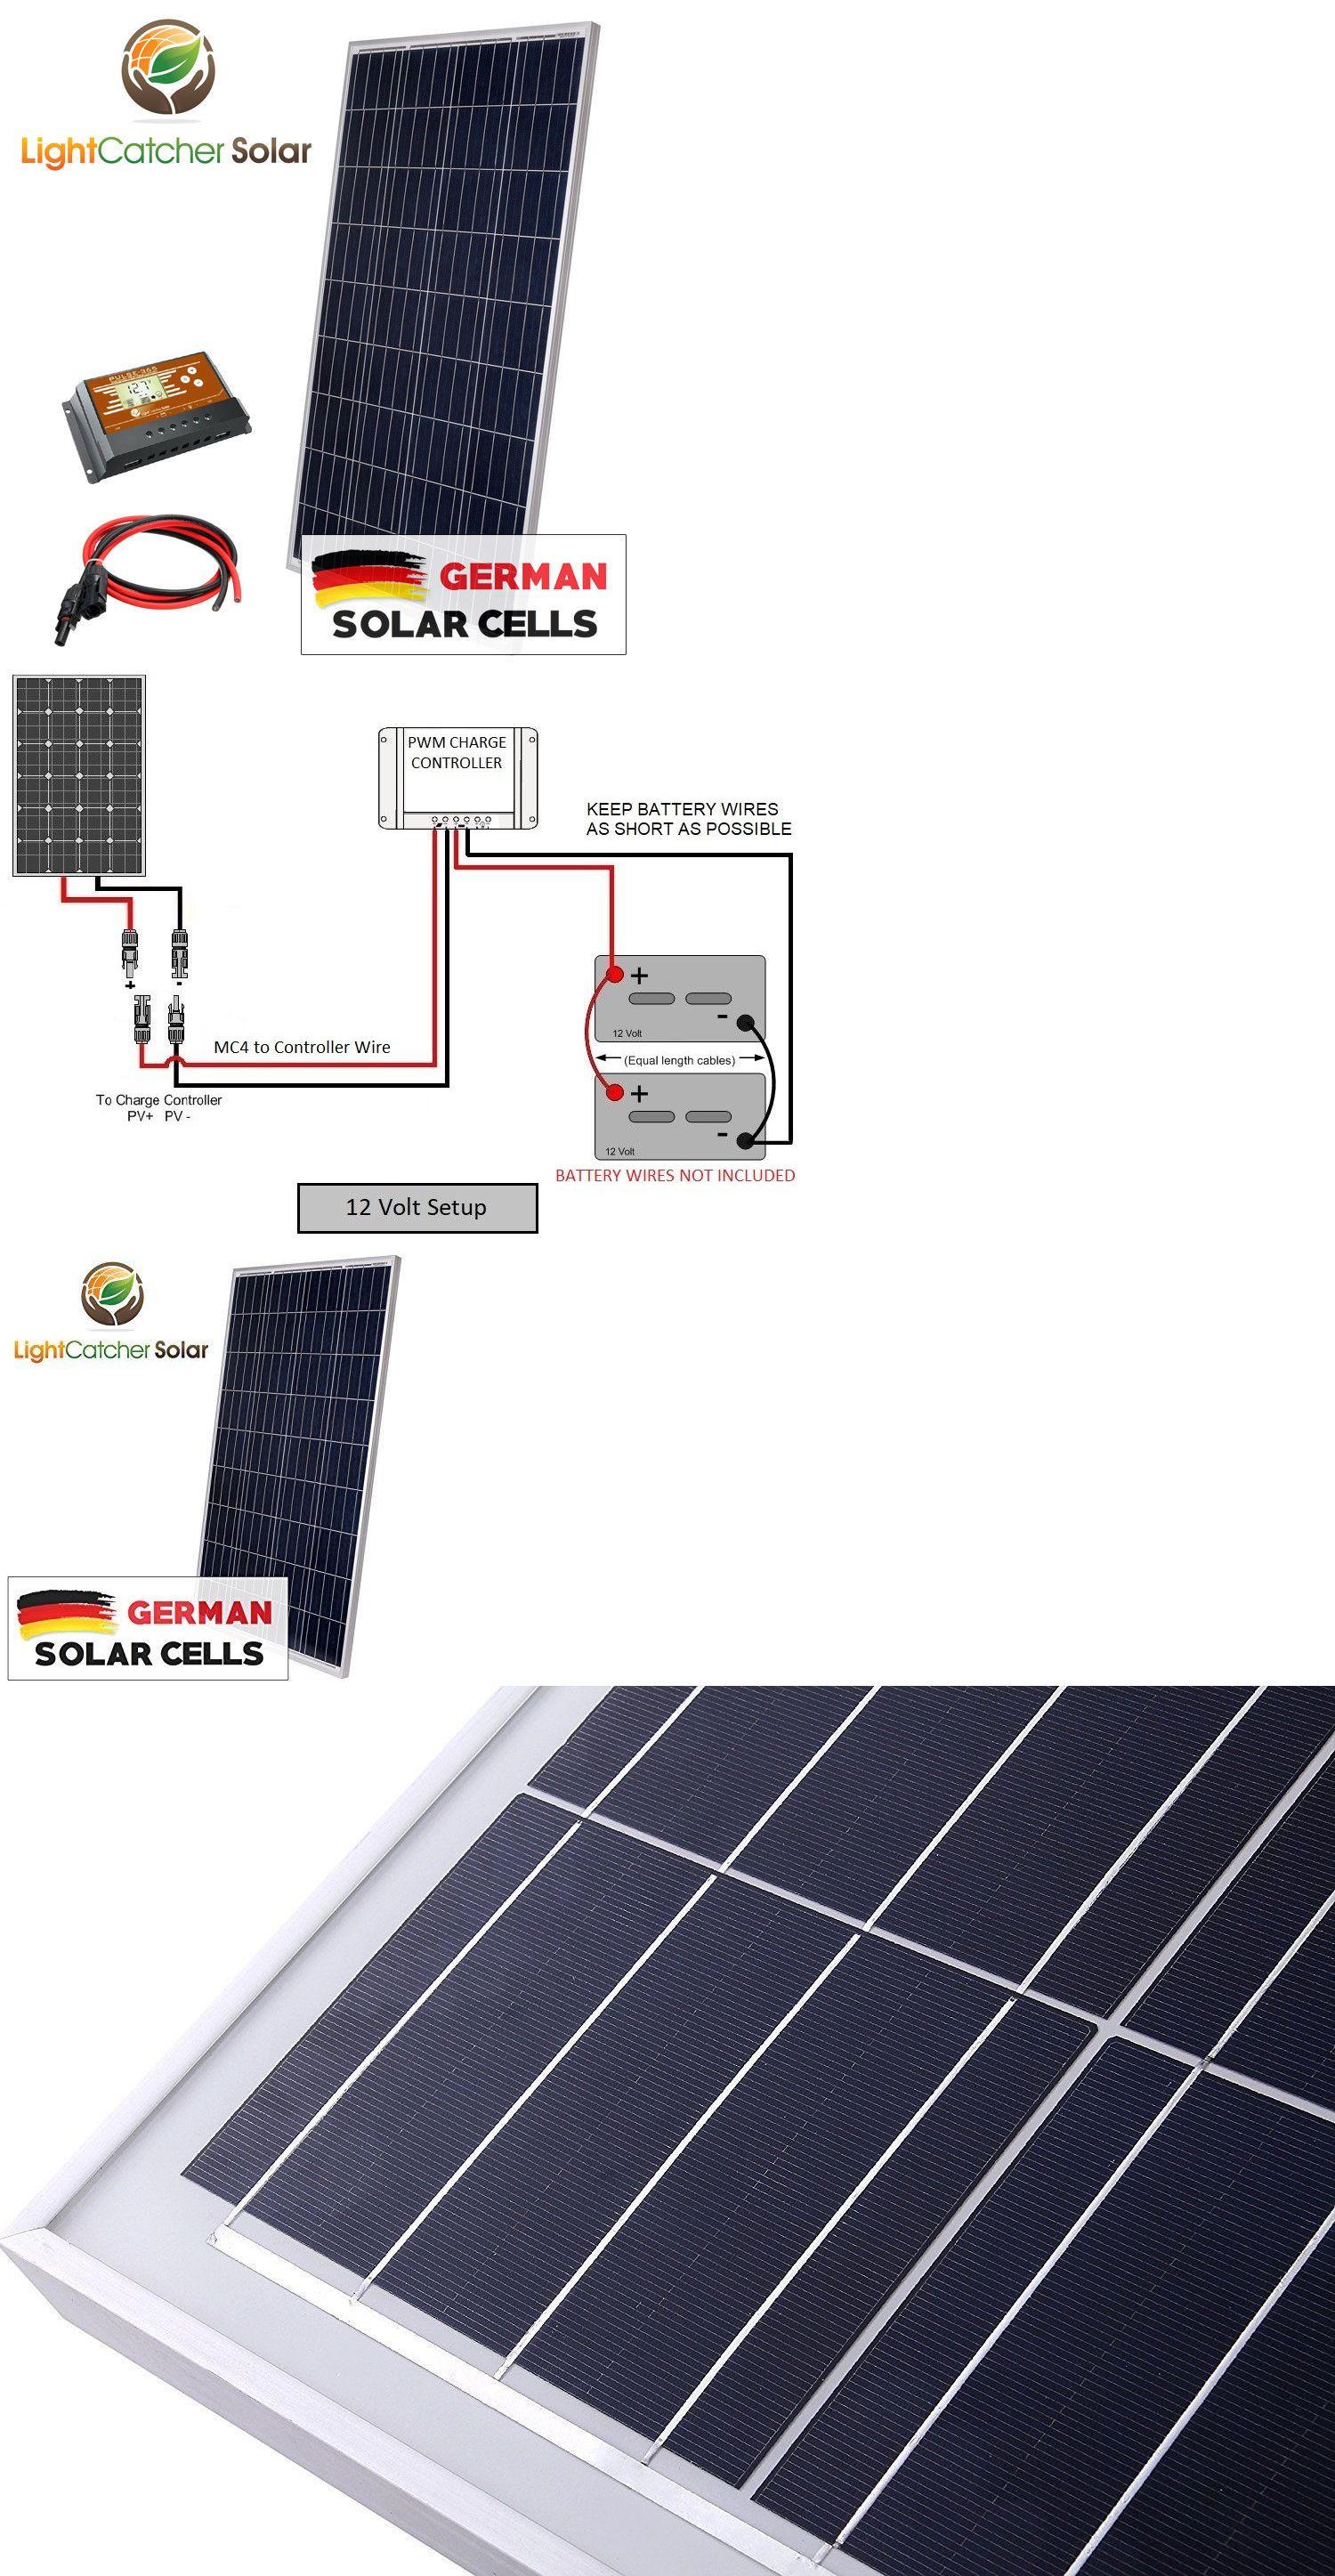 100 Watt Solar Panel Kit Rv Kit With Wires 100w For Rv Shed 12v Battery Charger Solar Panels 100 Watt Solar Panel Solar Panel Kits